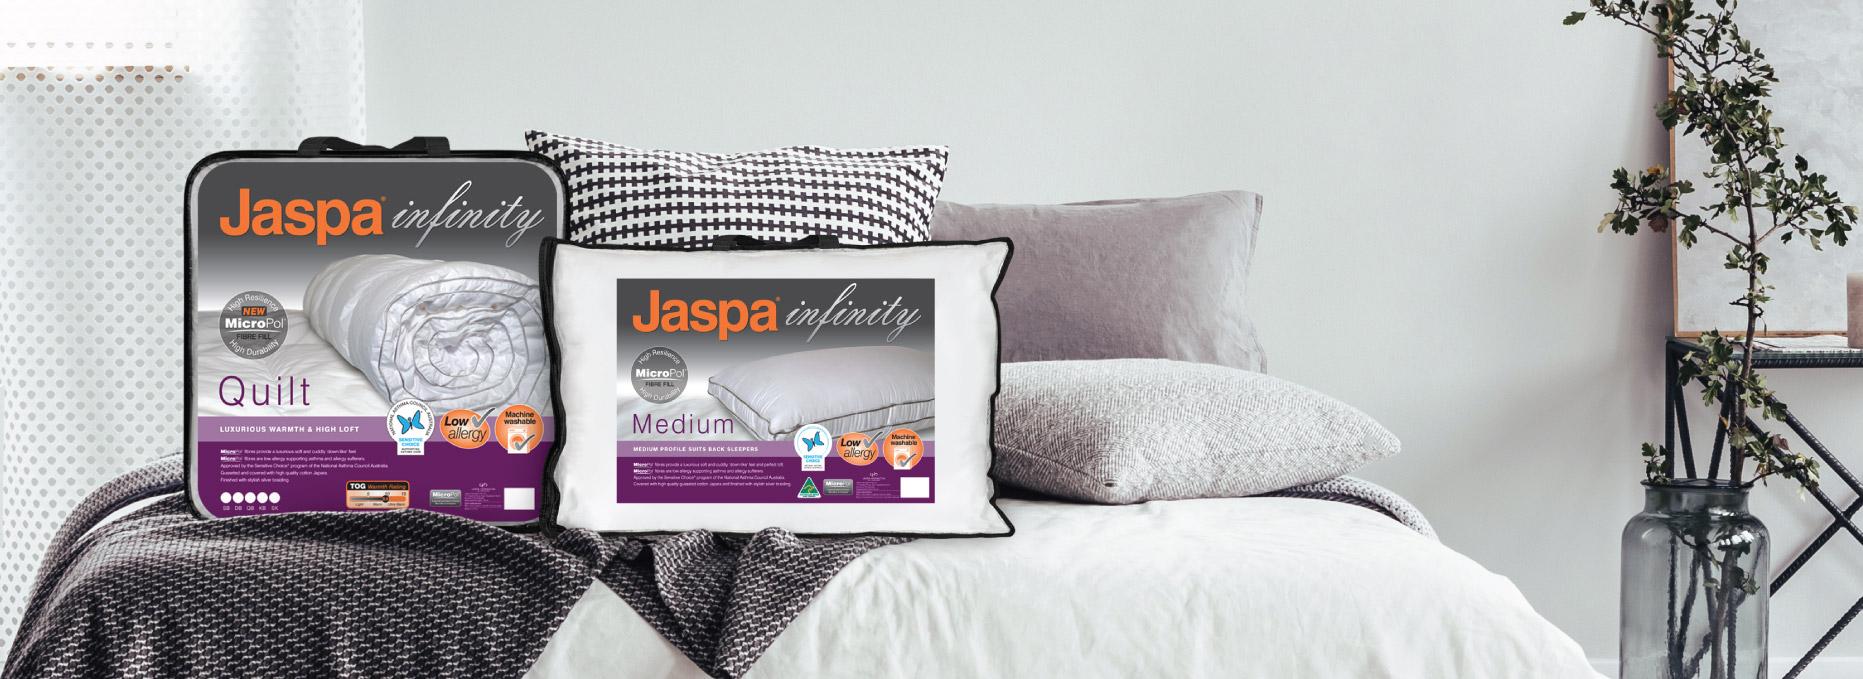 Jaspa Infinity